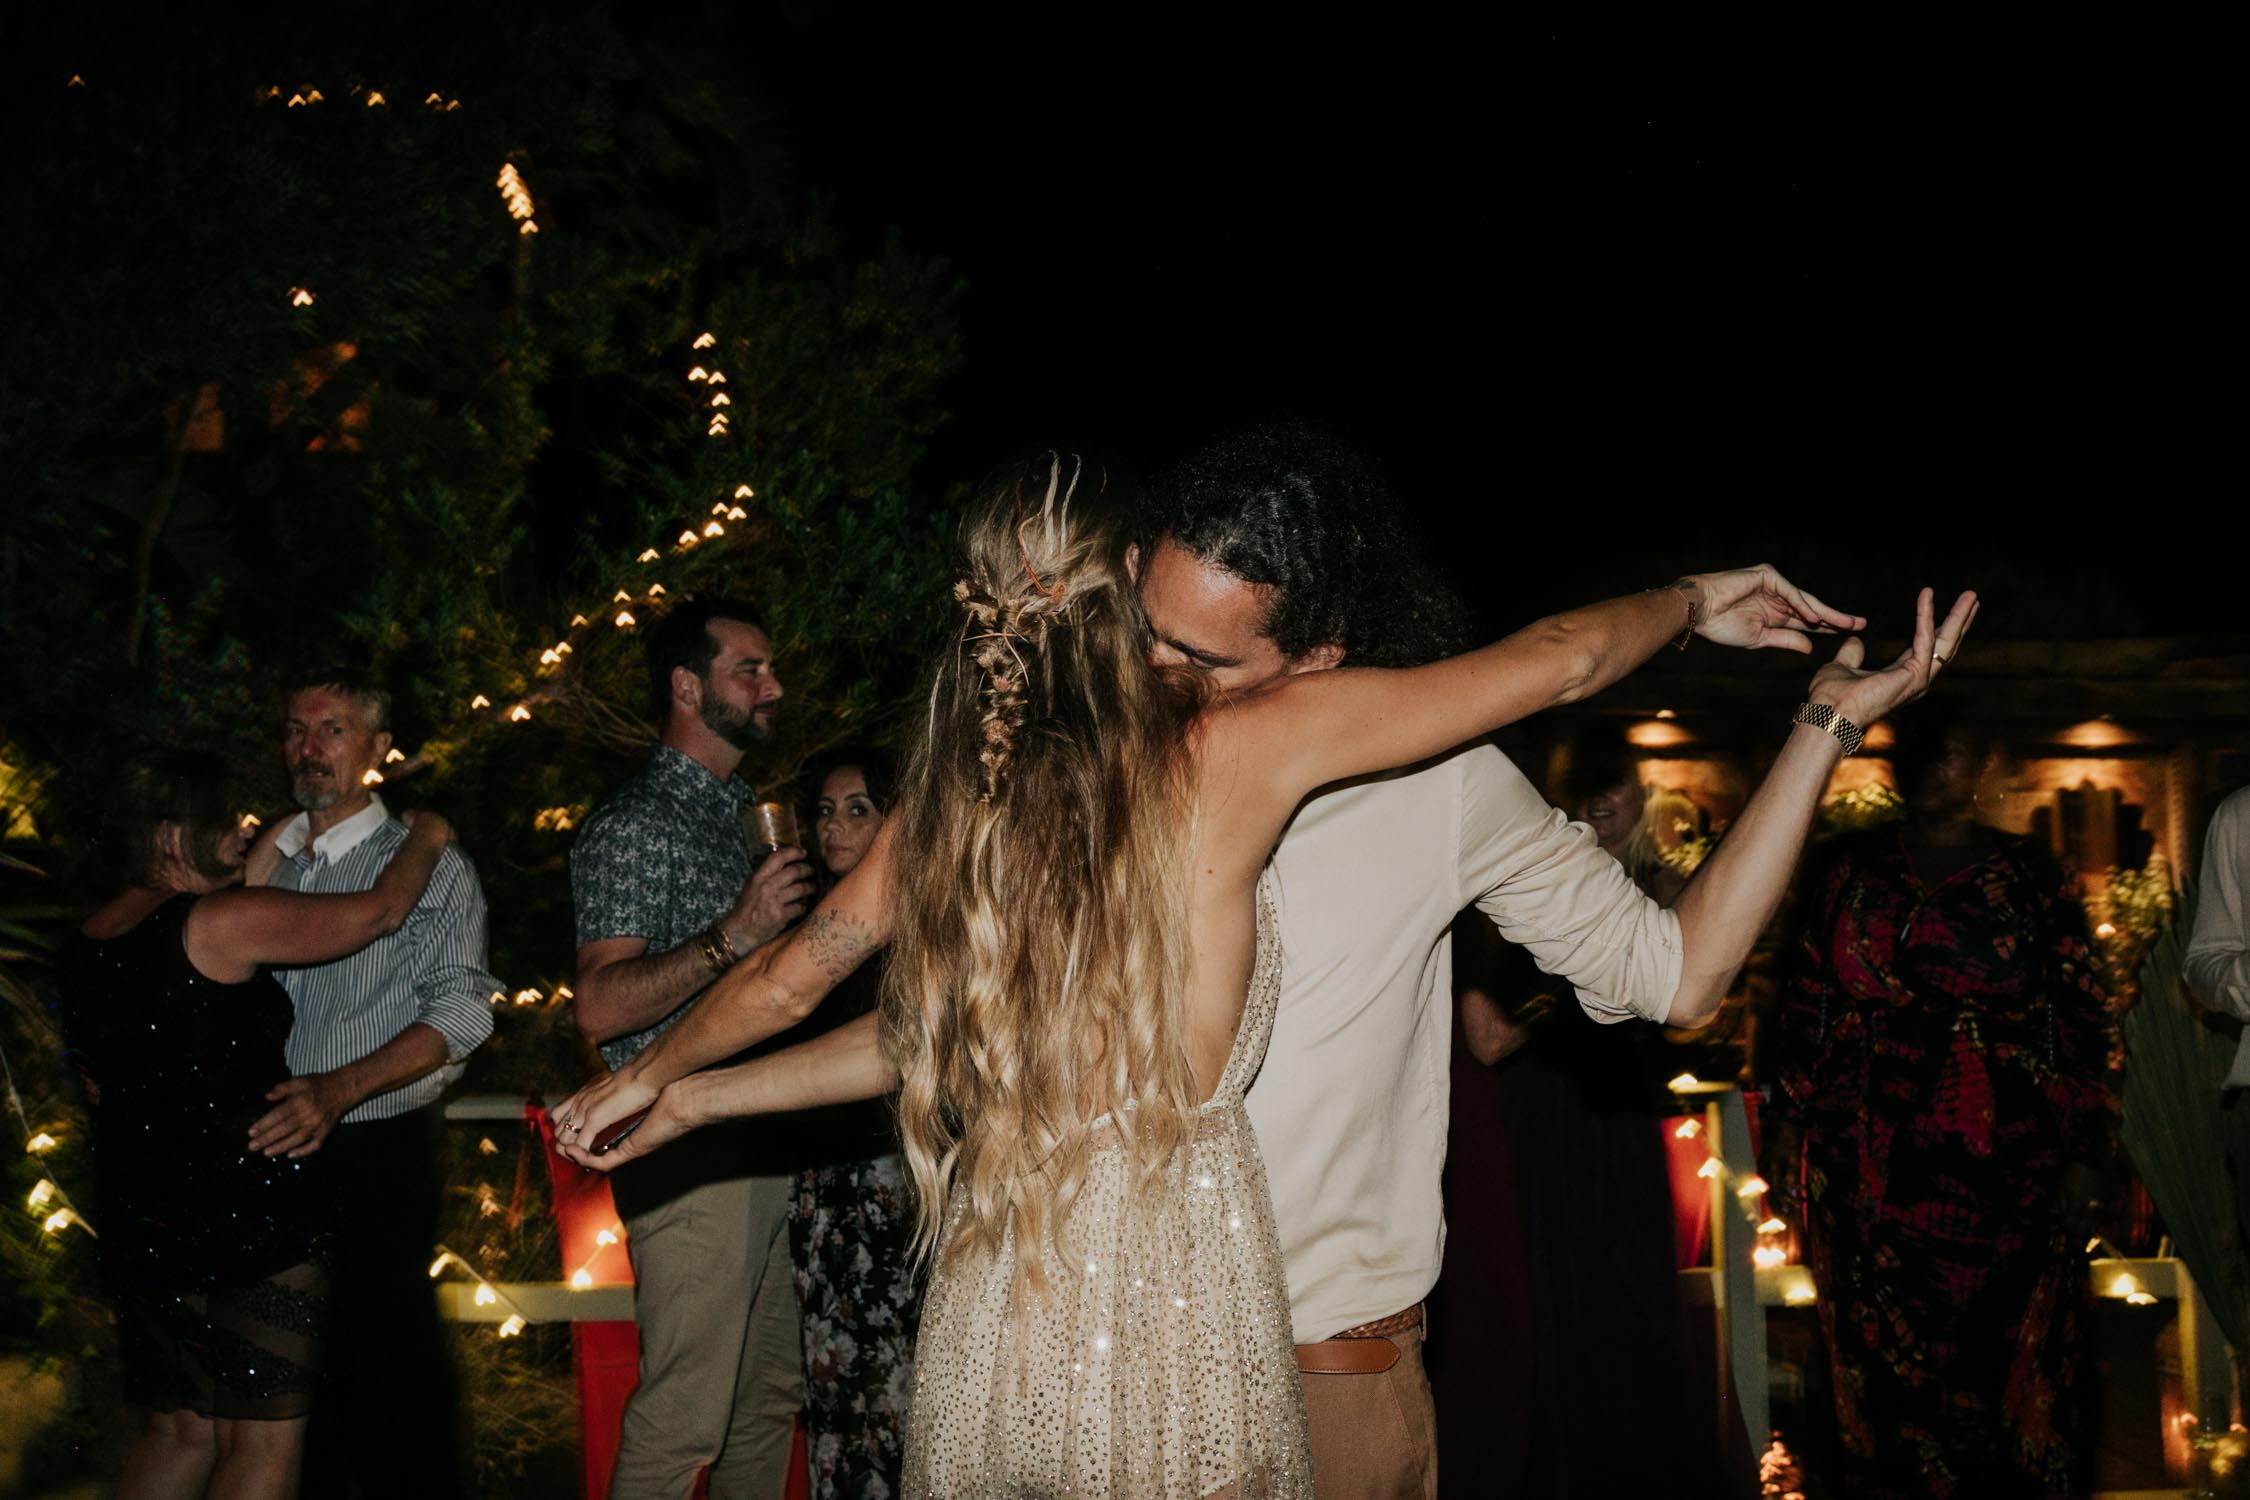 Bride wears sheer golden glitter boho wedding dress for dancing at wedding